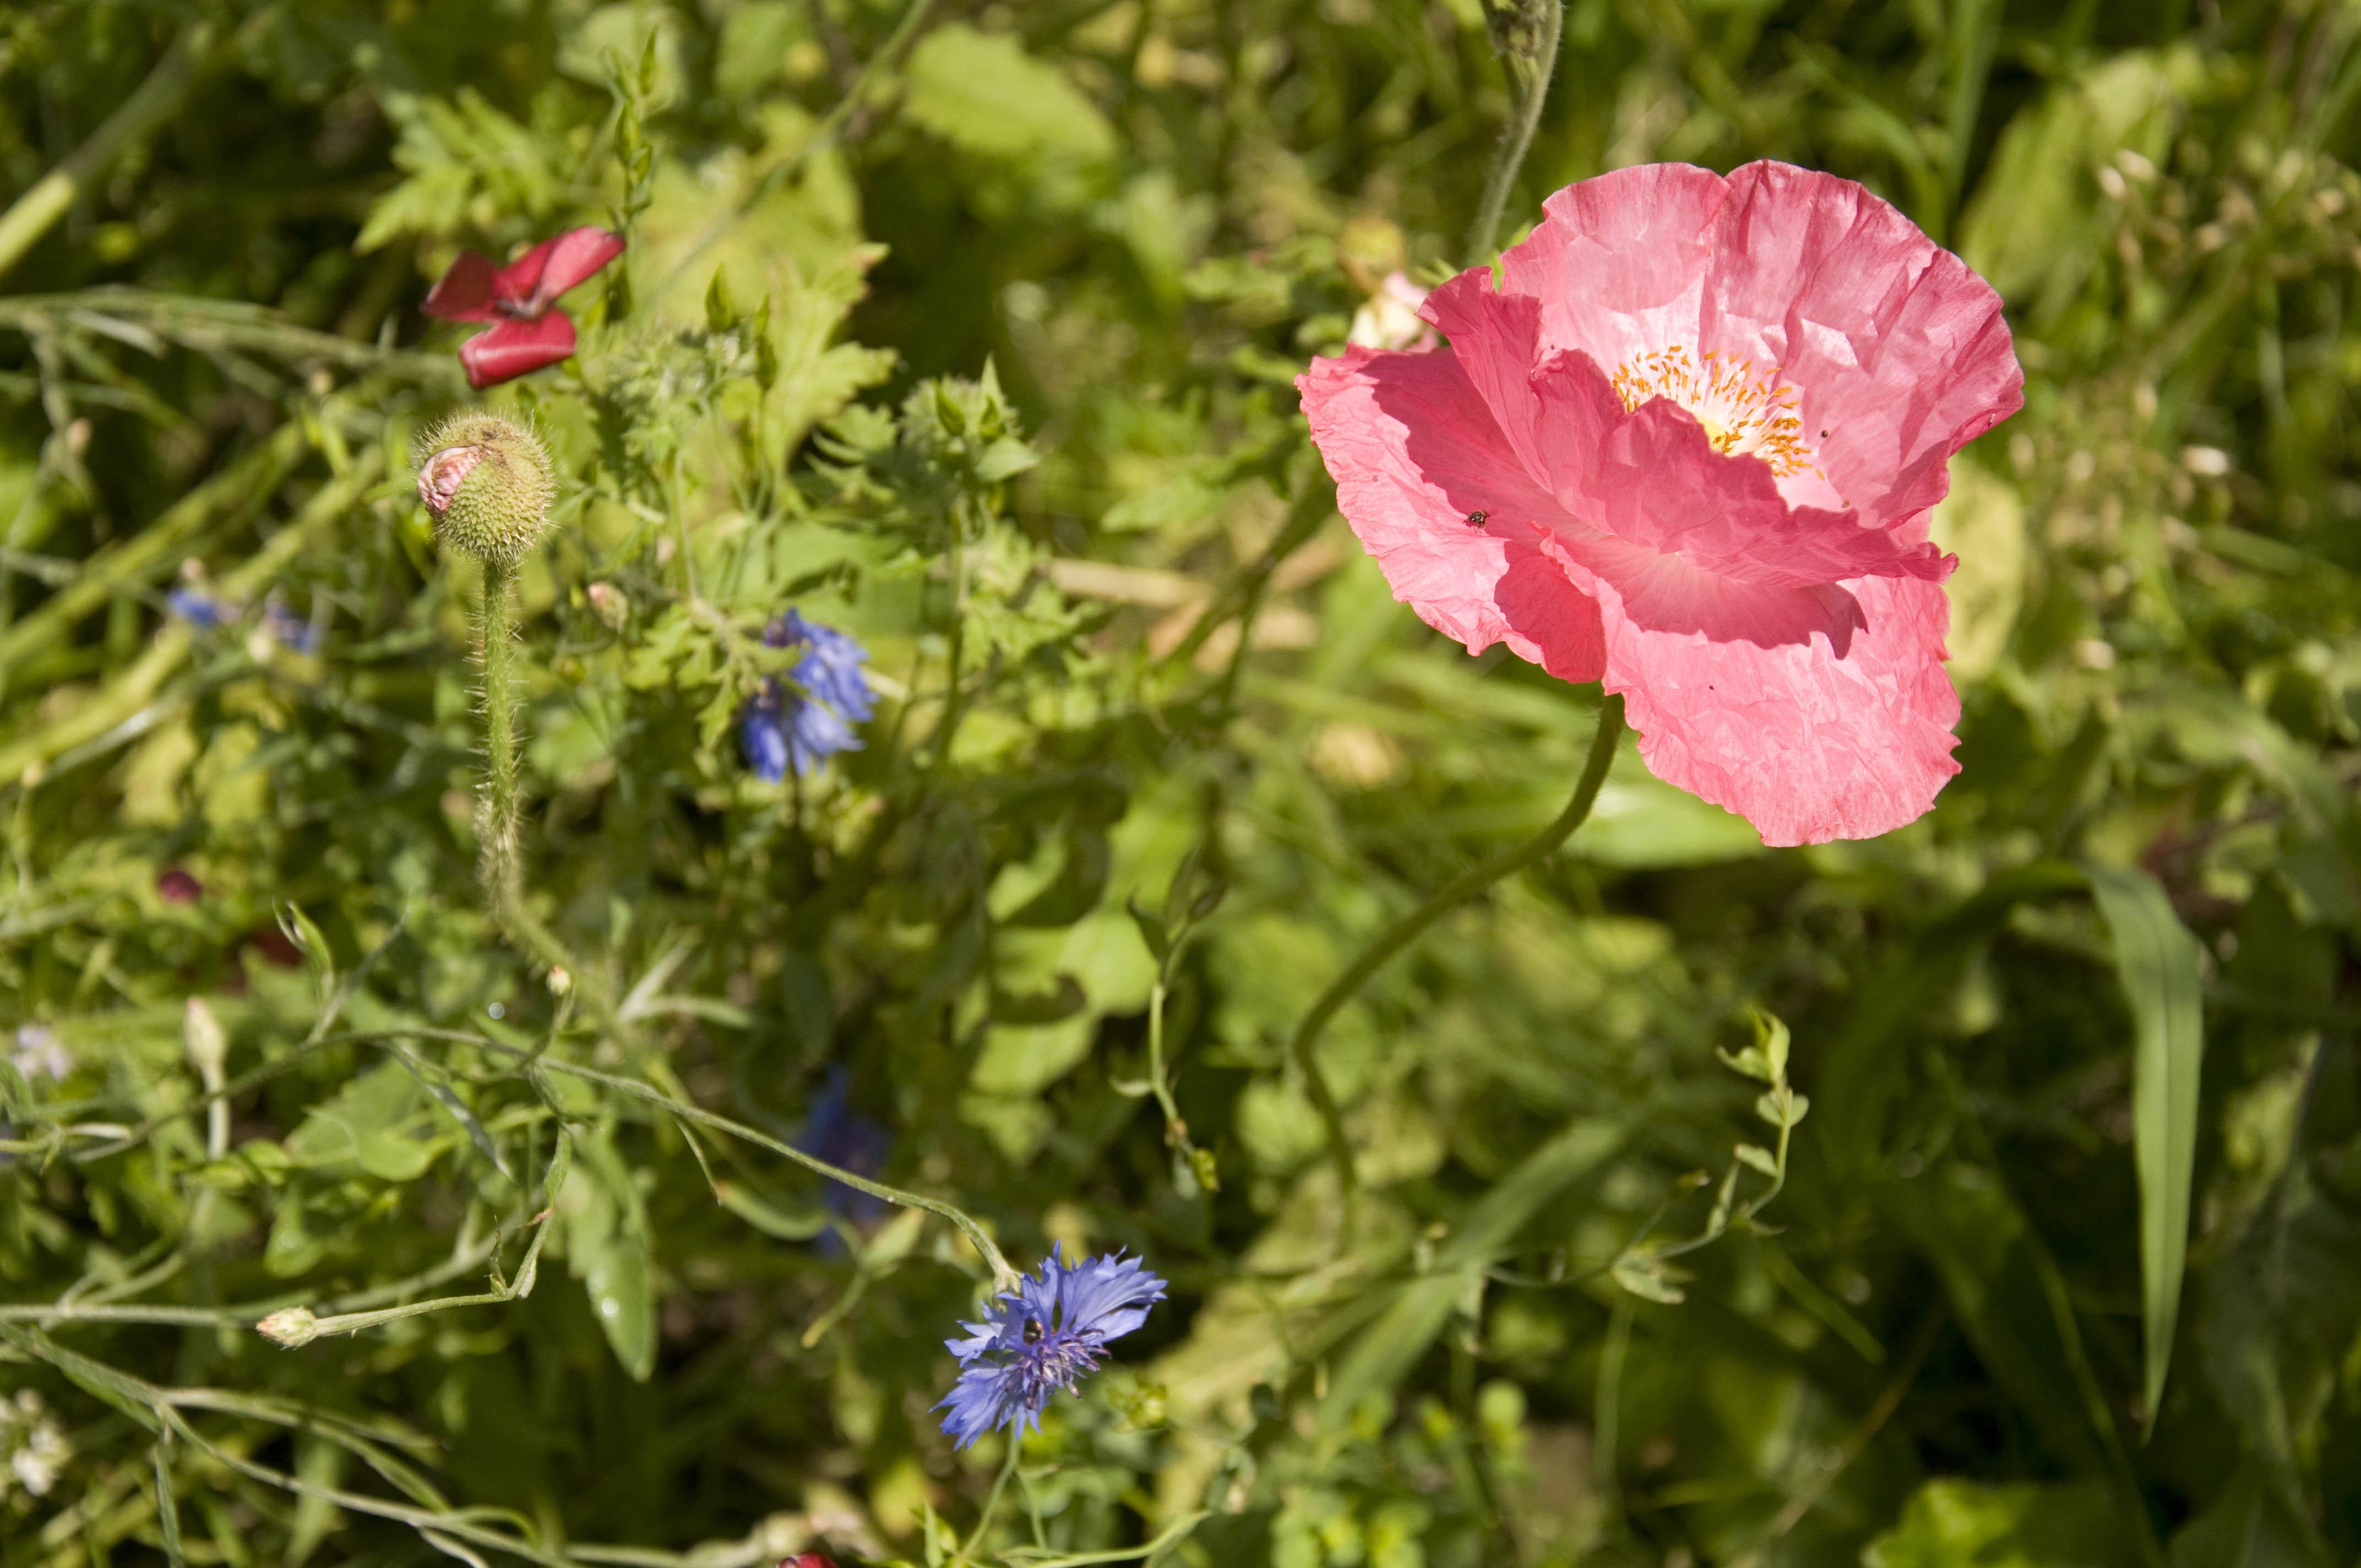 LMünch_HPLG_Garden_2014-6